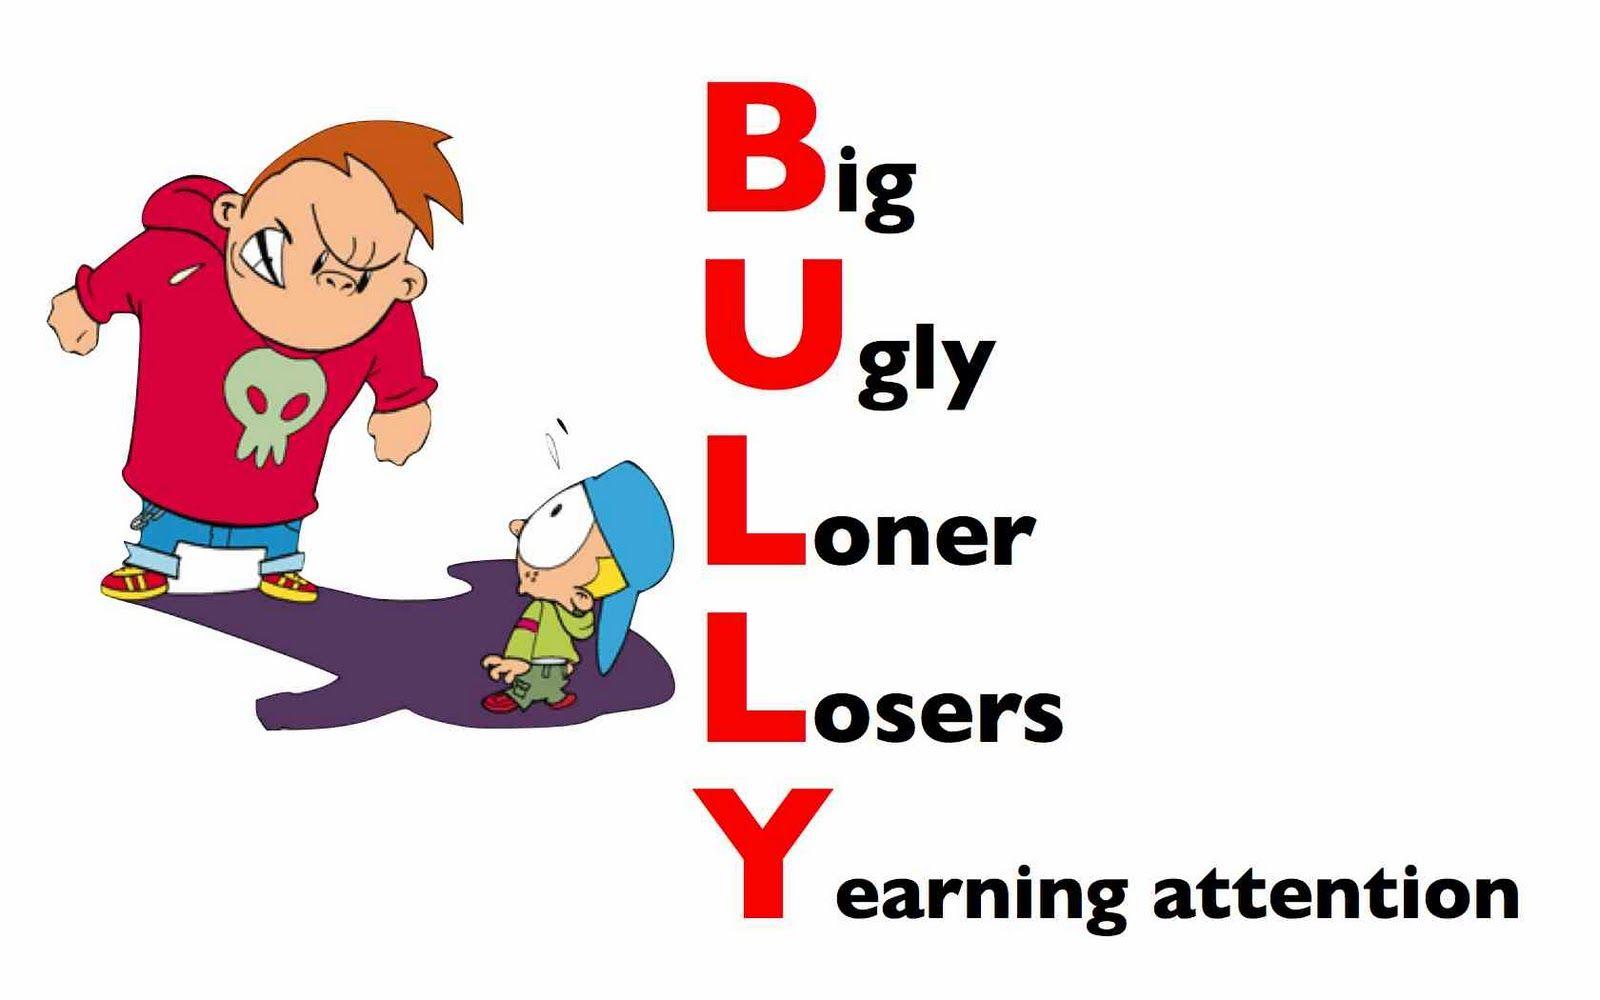 20 Bullying Cartoons ideas | bullying, stop bullying, anti bullying